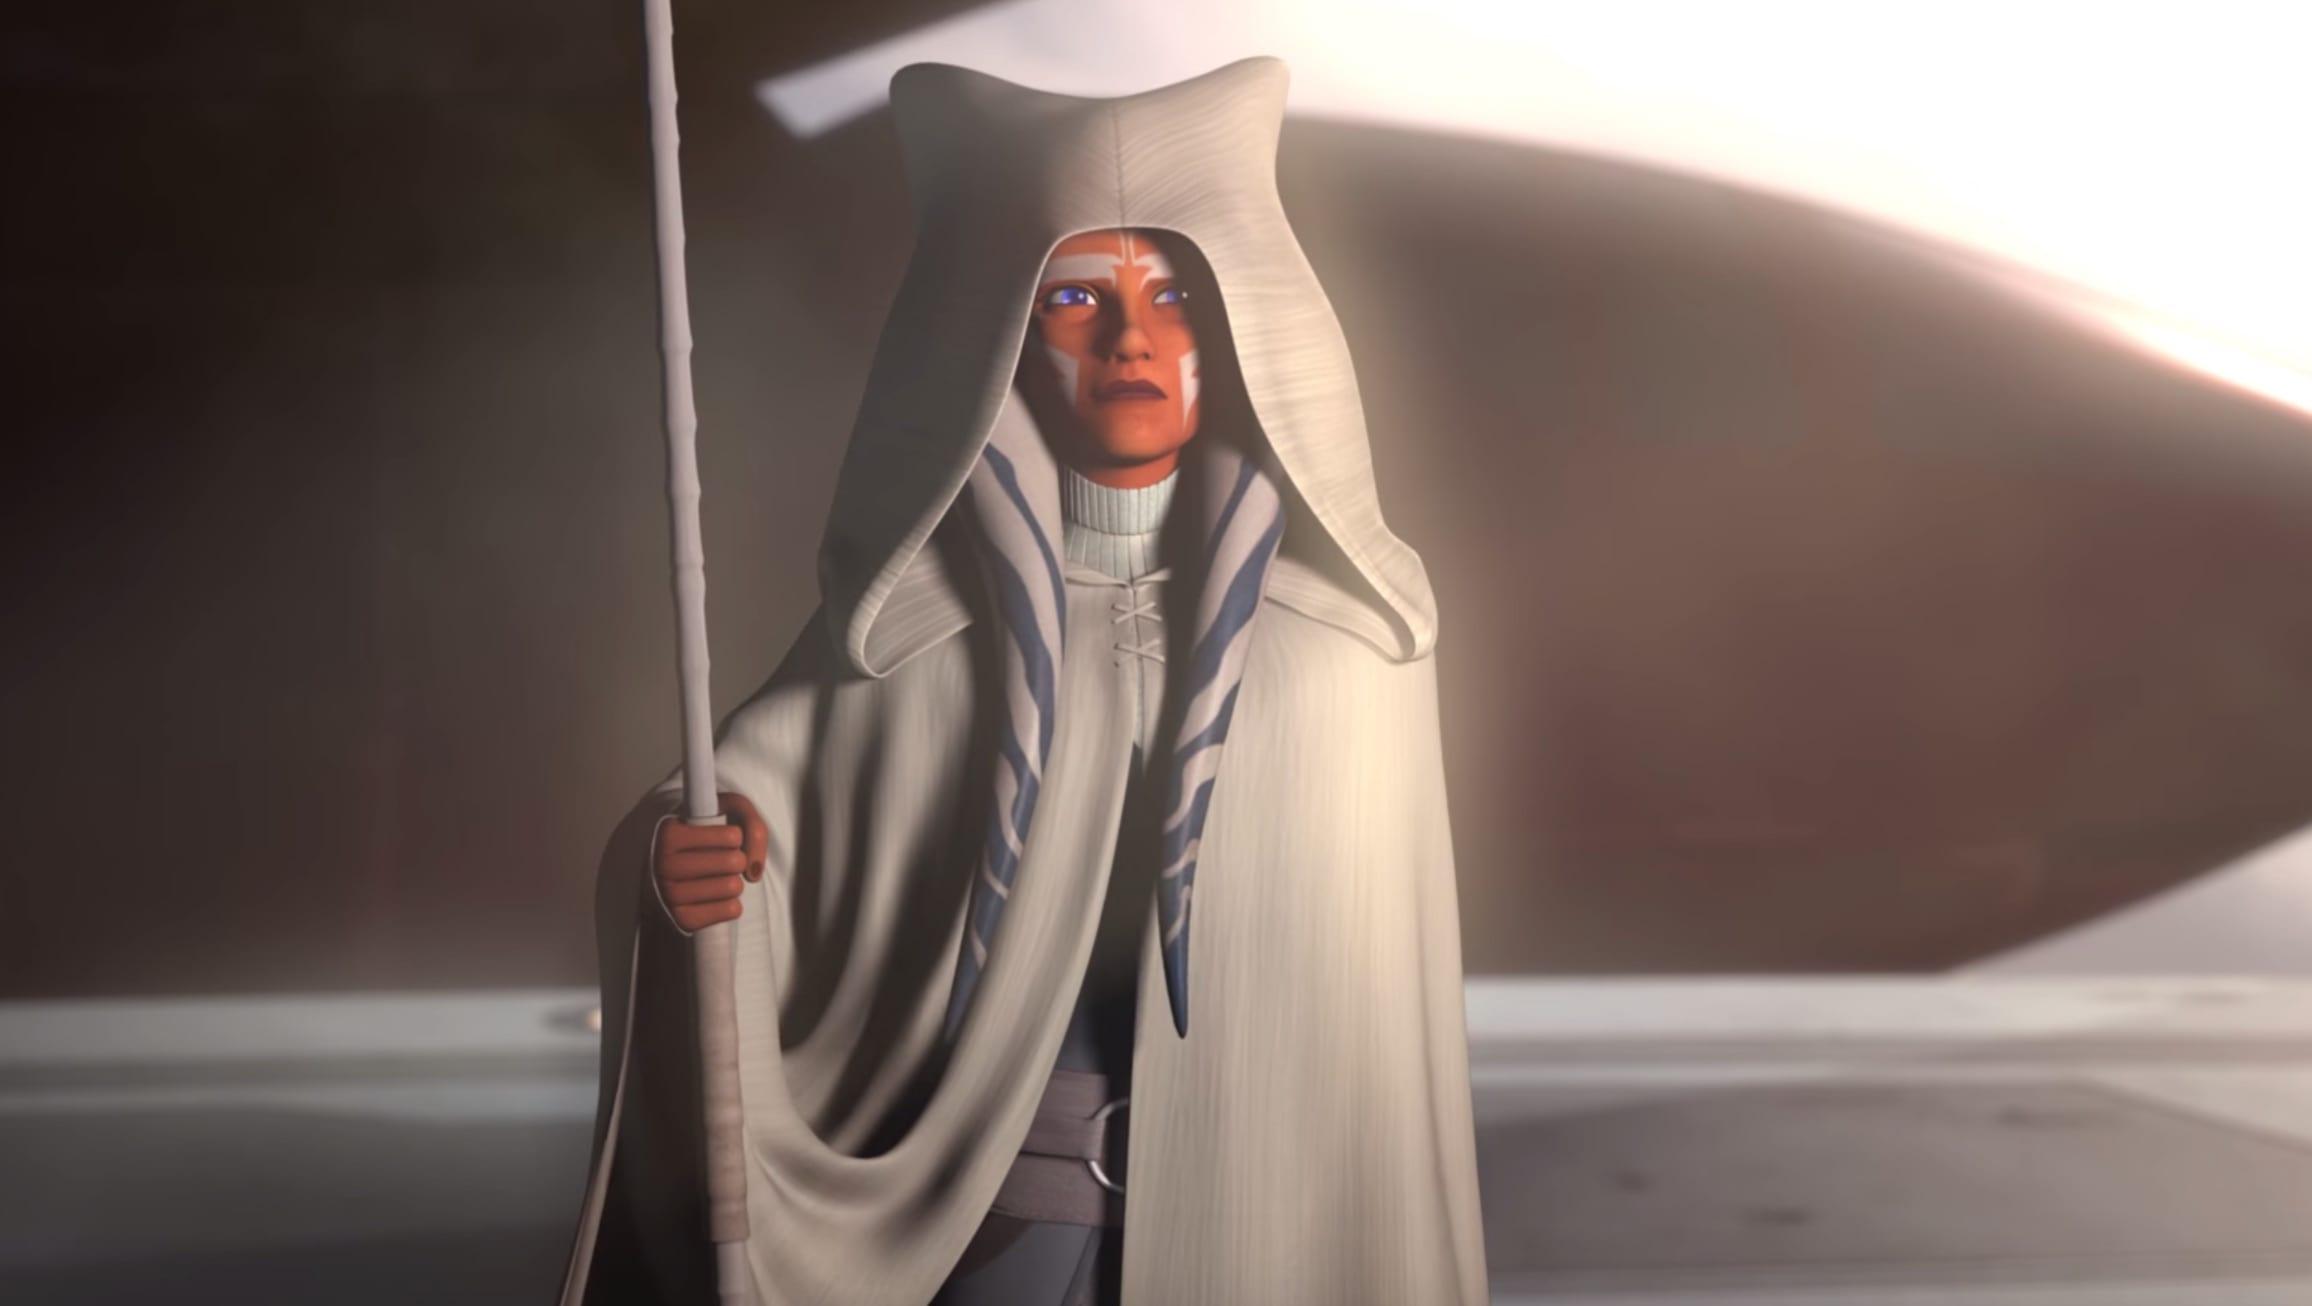 The Mandalorian, The Jedi